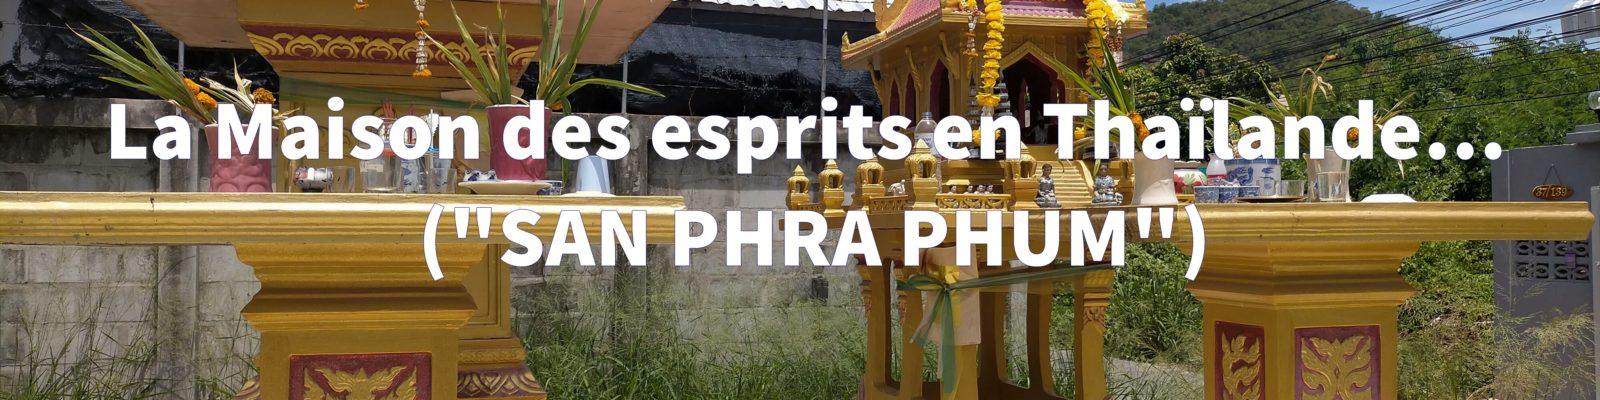 La Maison des esprits en Thaïlande… San Phra Phum